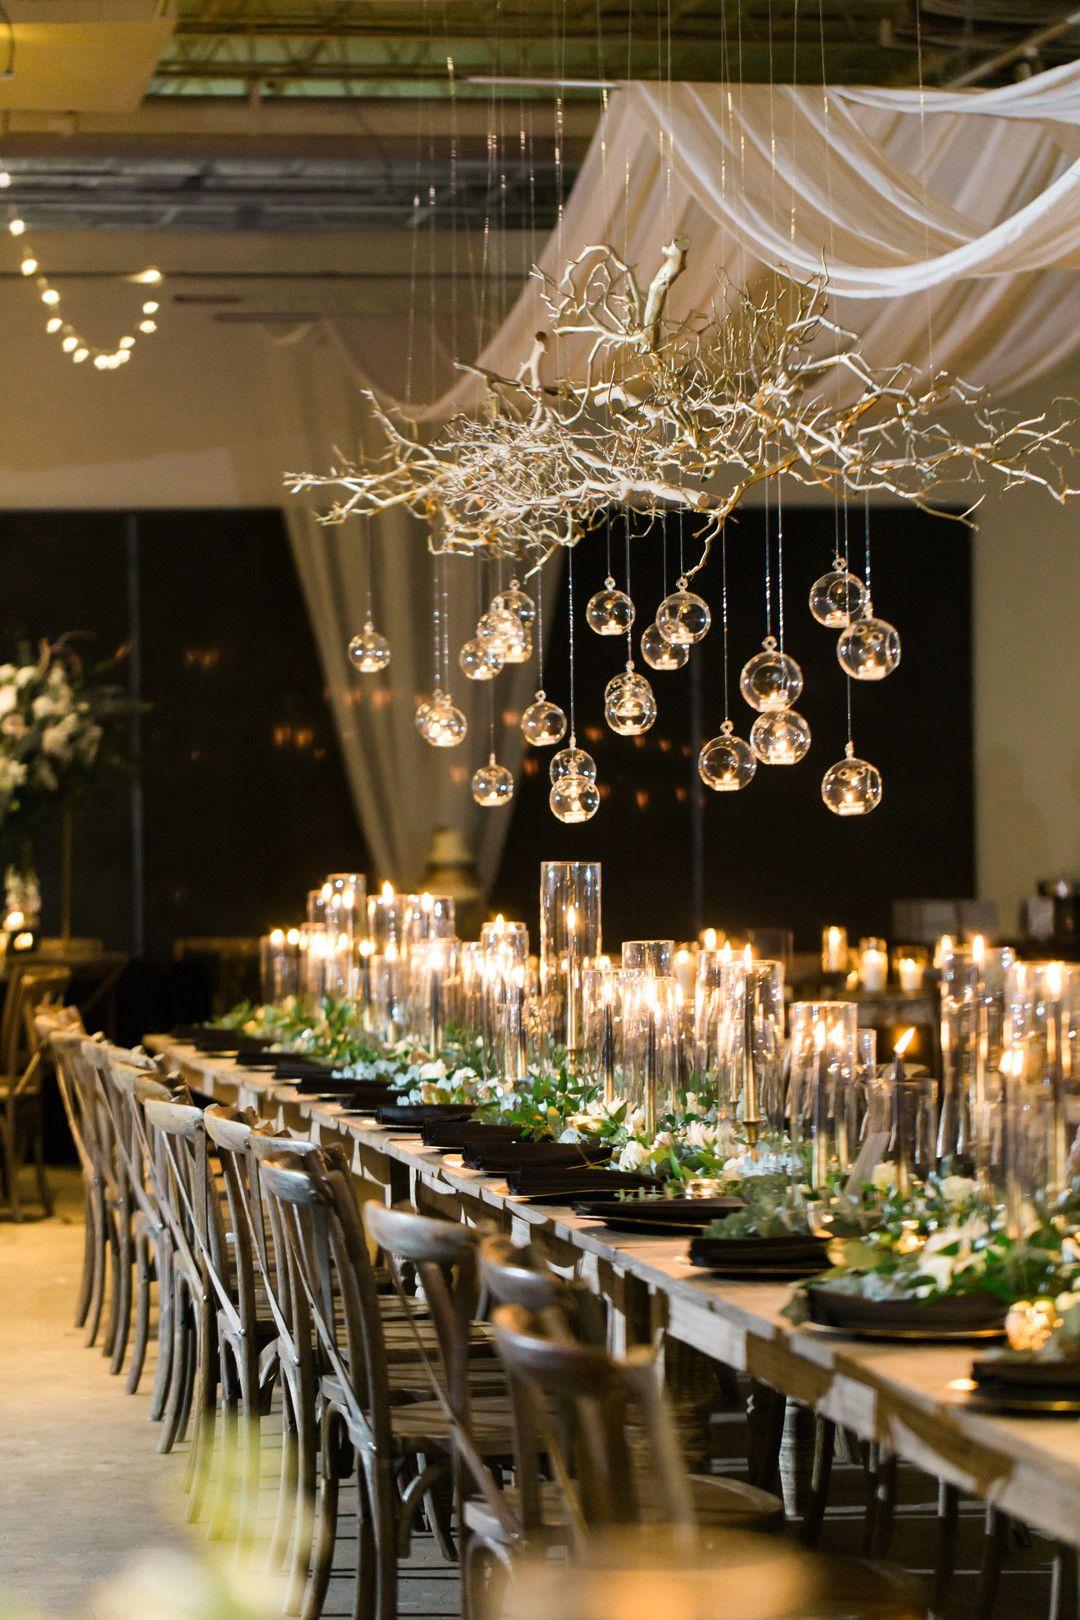 Jessica & Mark's Black & Gold New Year's Eve Wedding - The Celebration Society